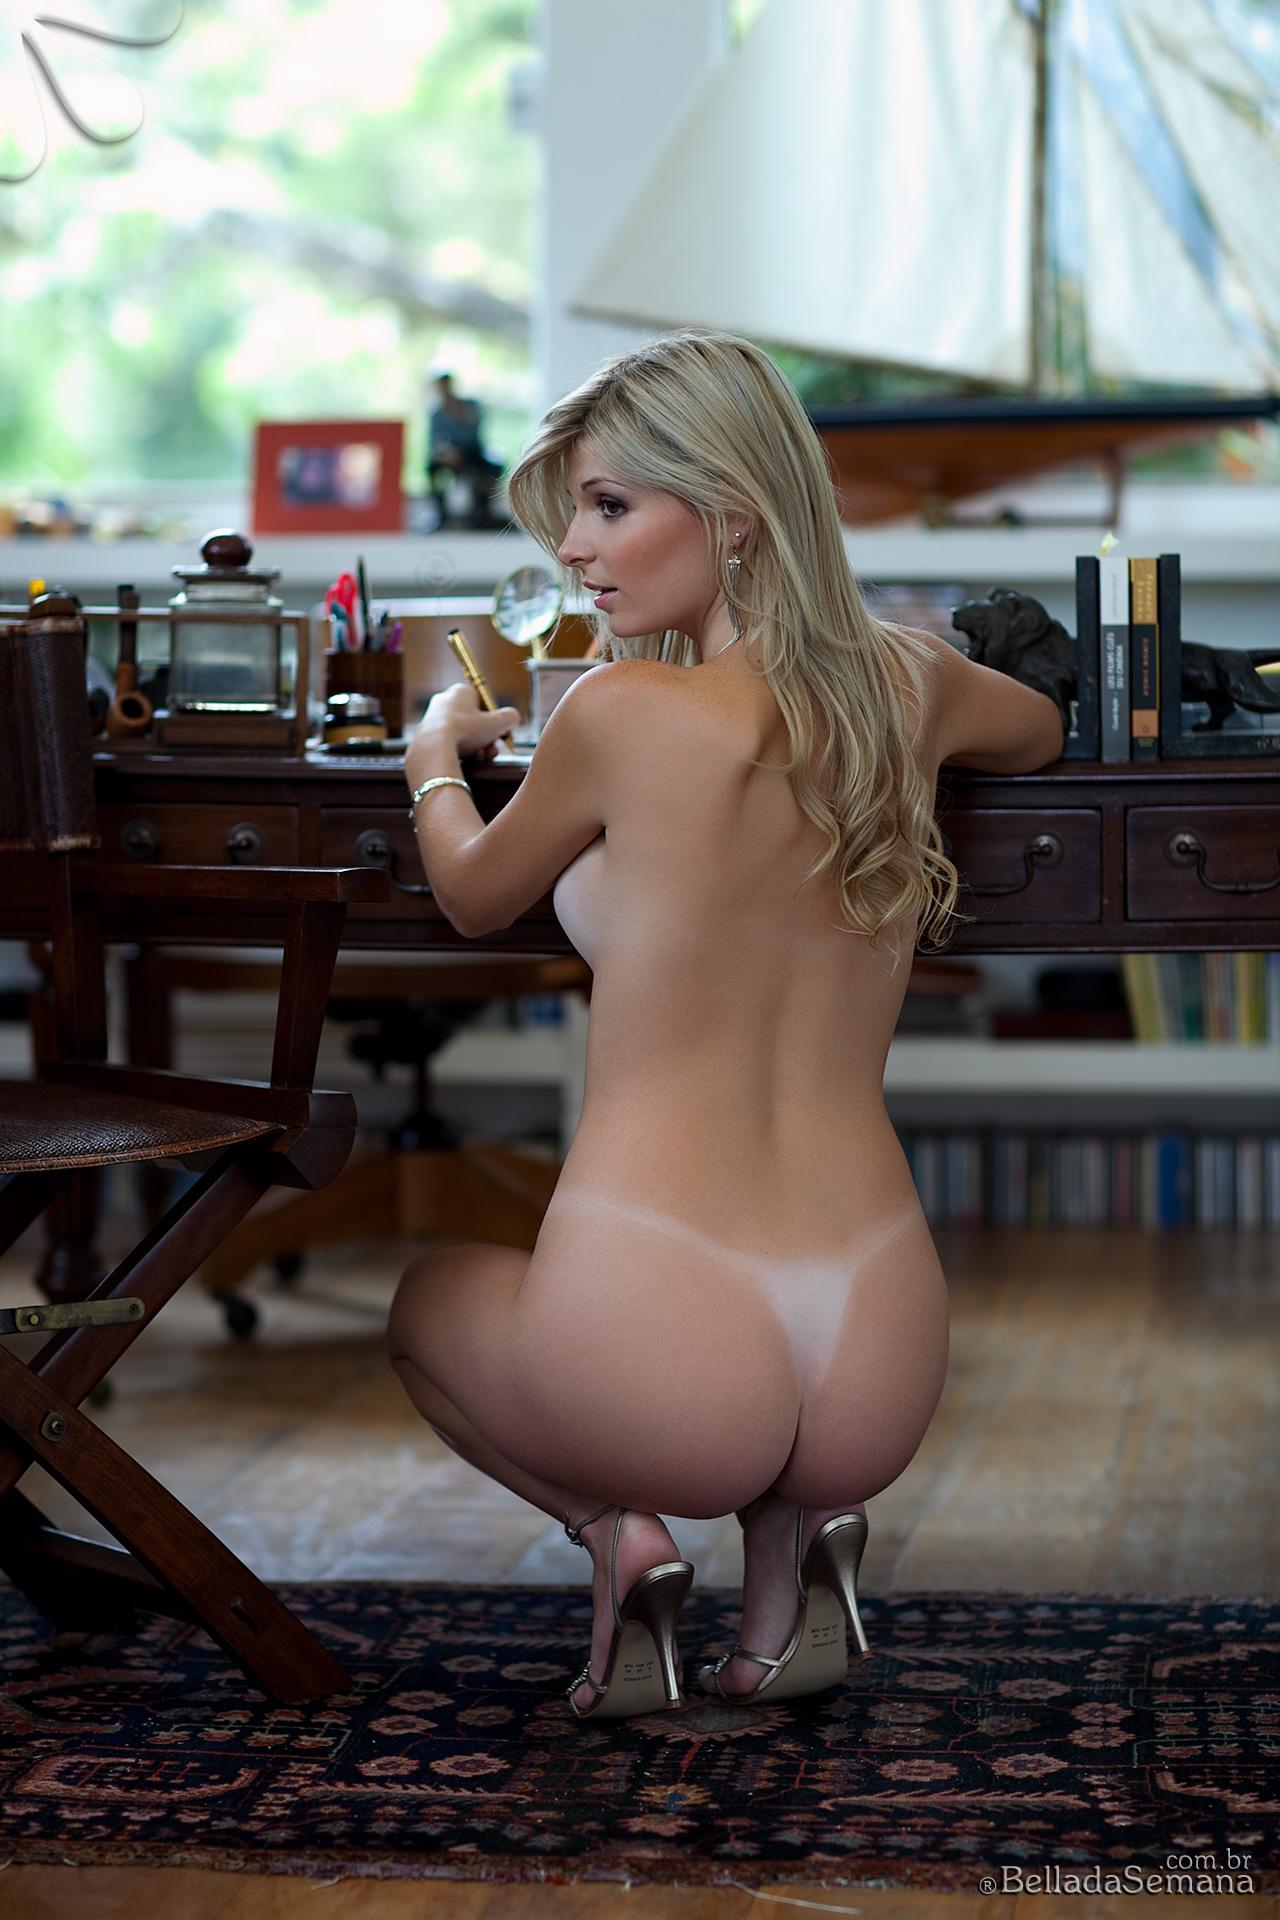 angelica-woicichoski-tan-lines-blonde-brazilian-bella-da-semana-11